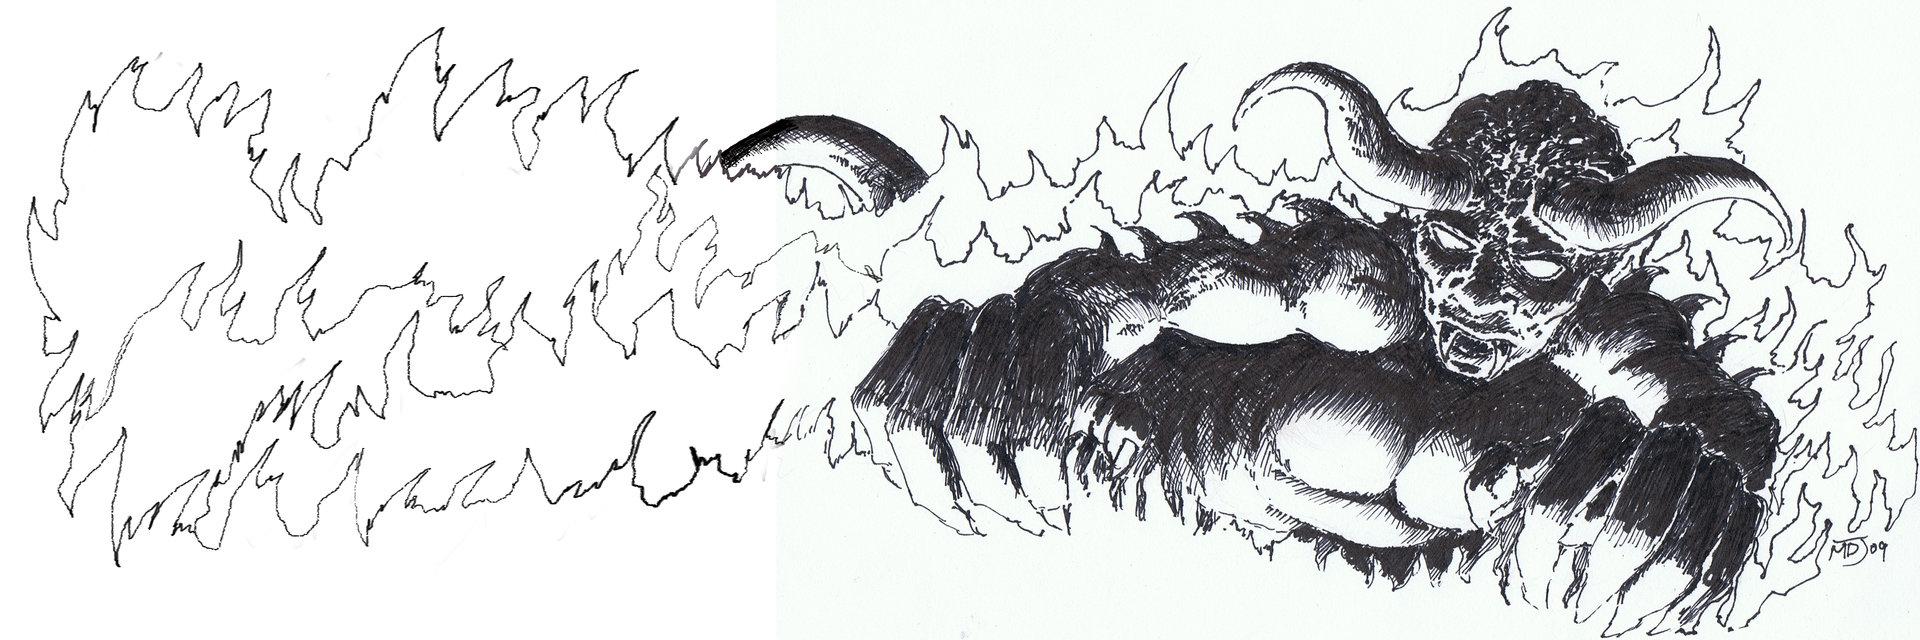 Md jackson demons 5